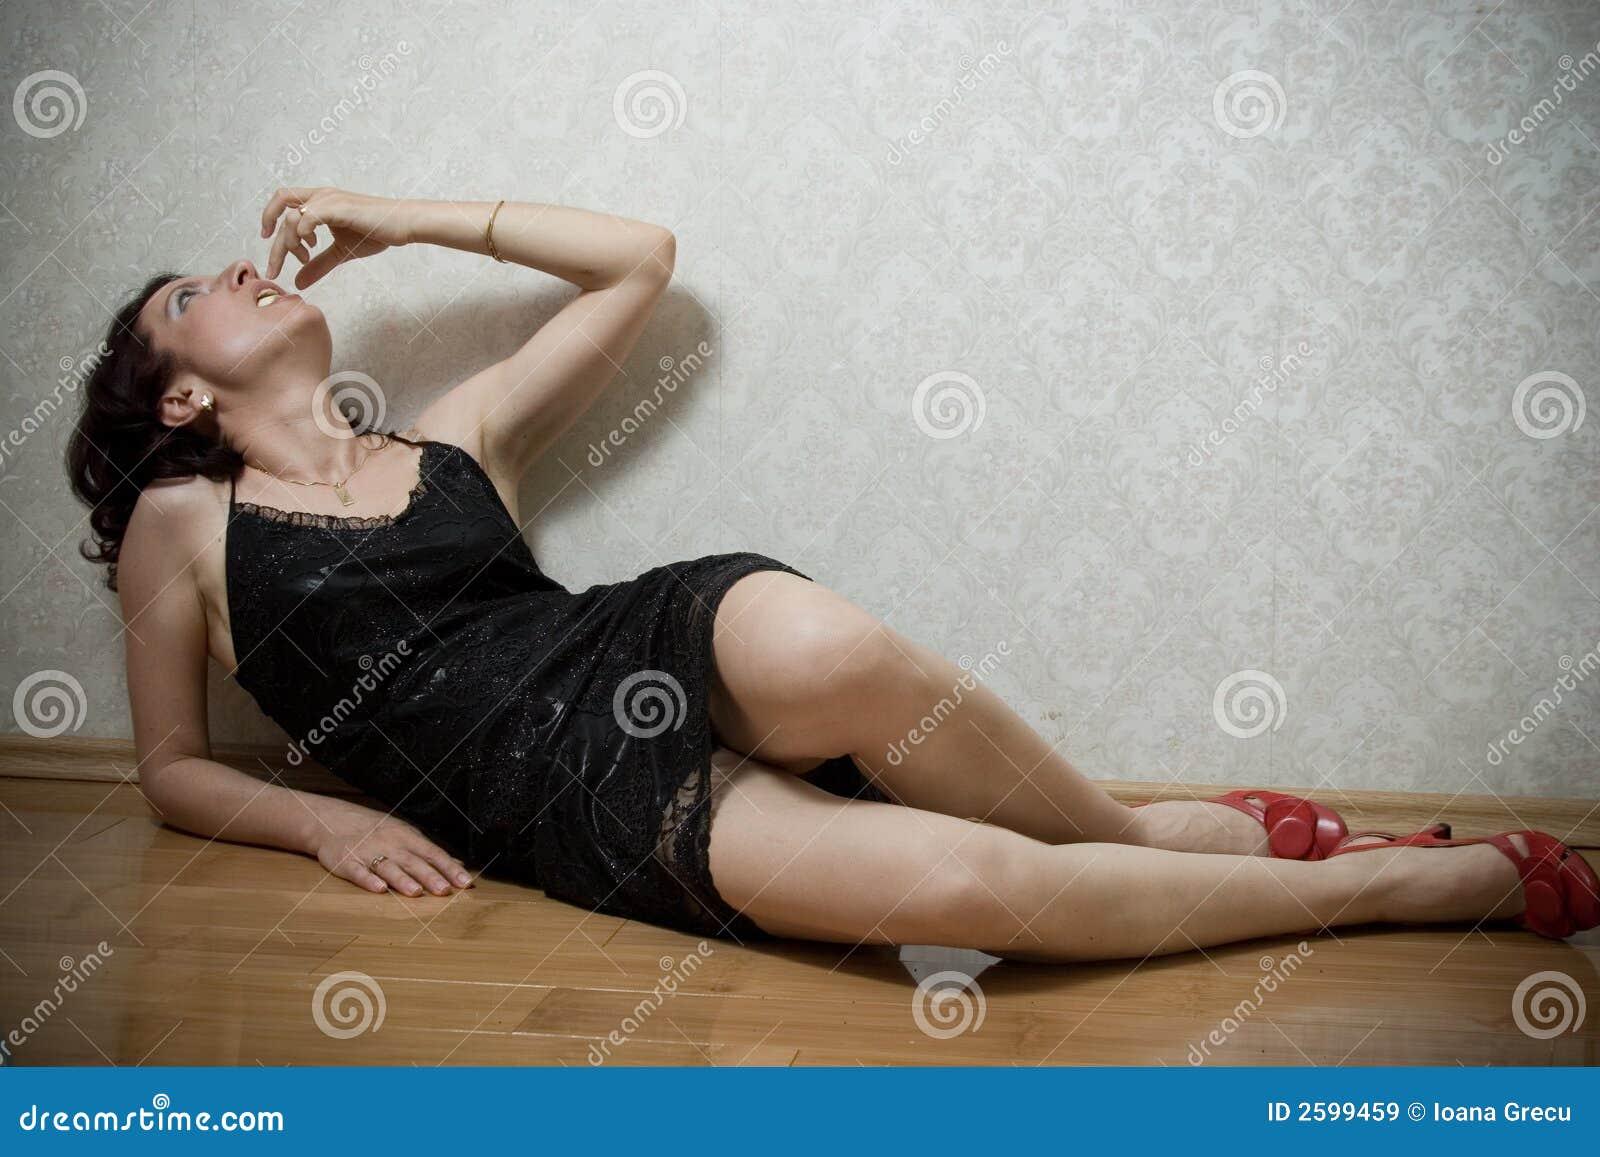 Woman Eating Banana Royalty Free Stock Images Image 2599459